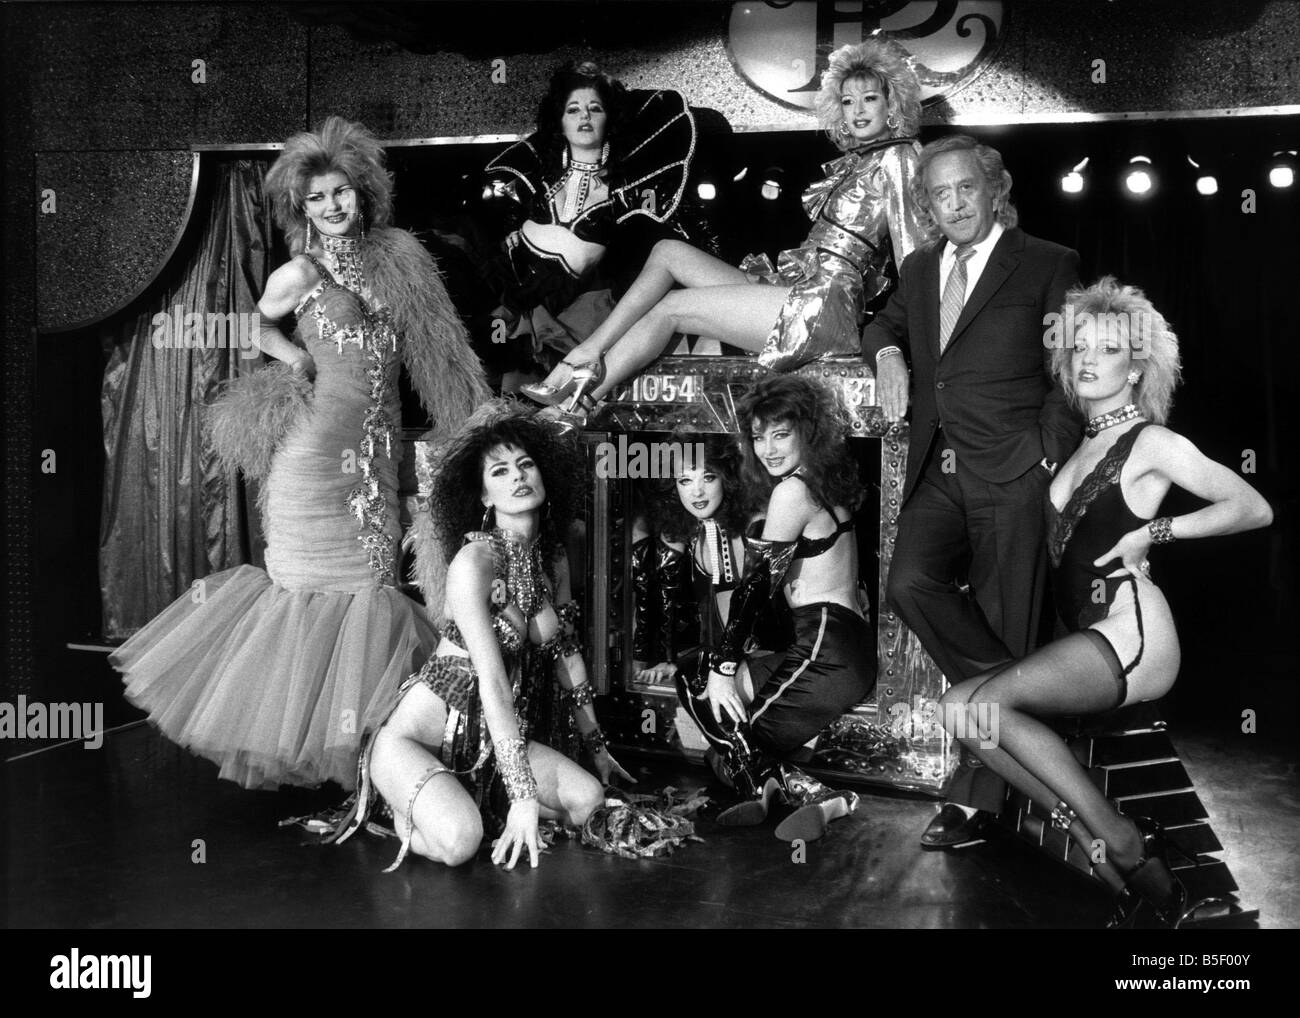 Paul raymond revue bar